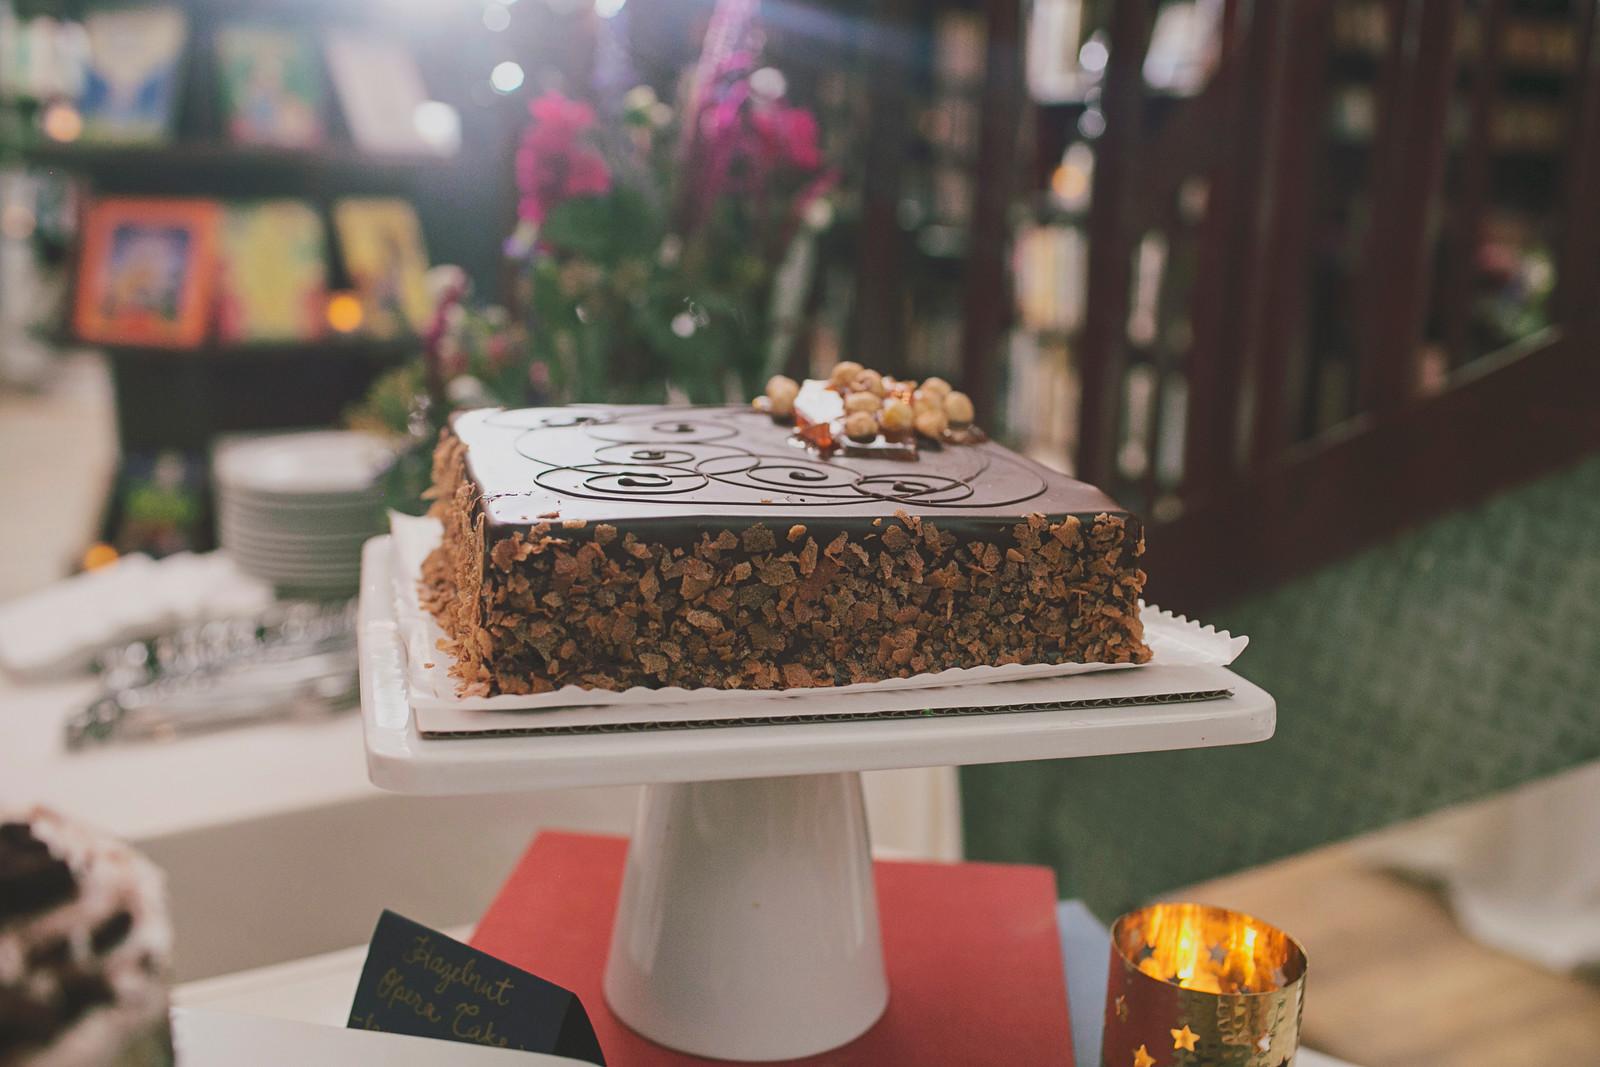 hazelnut-opera-wedding-cake.jpg